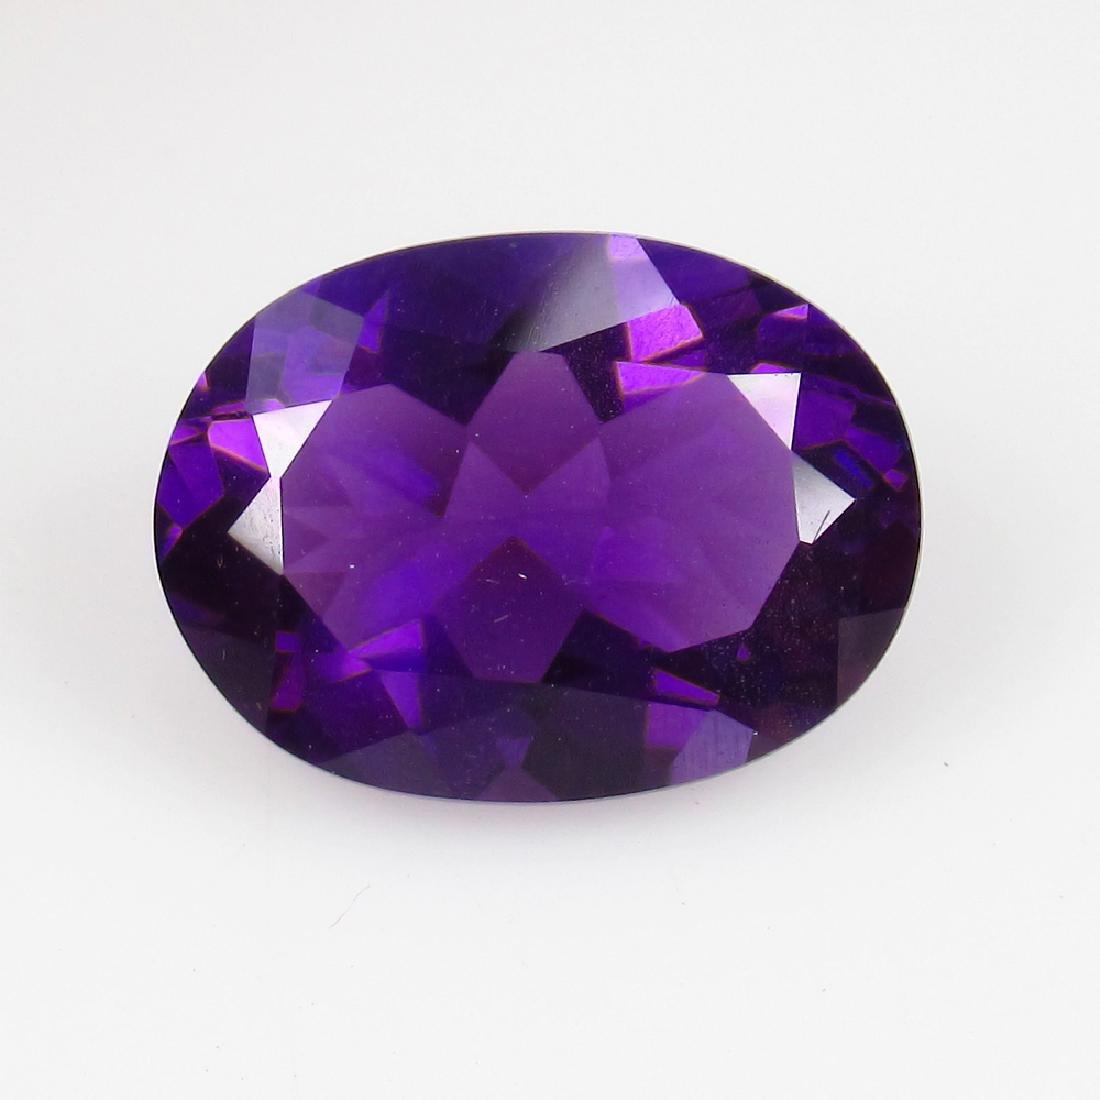 4.79 Ct IGI Certified Genuine Brazil Purple Amethyst